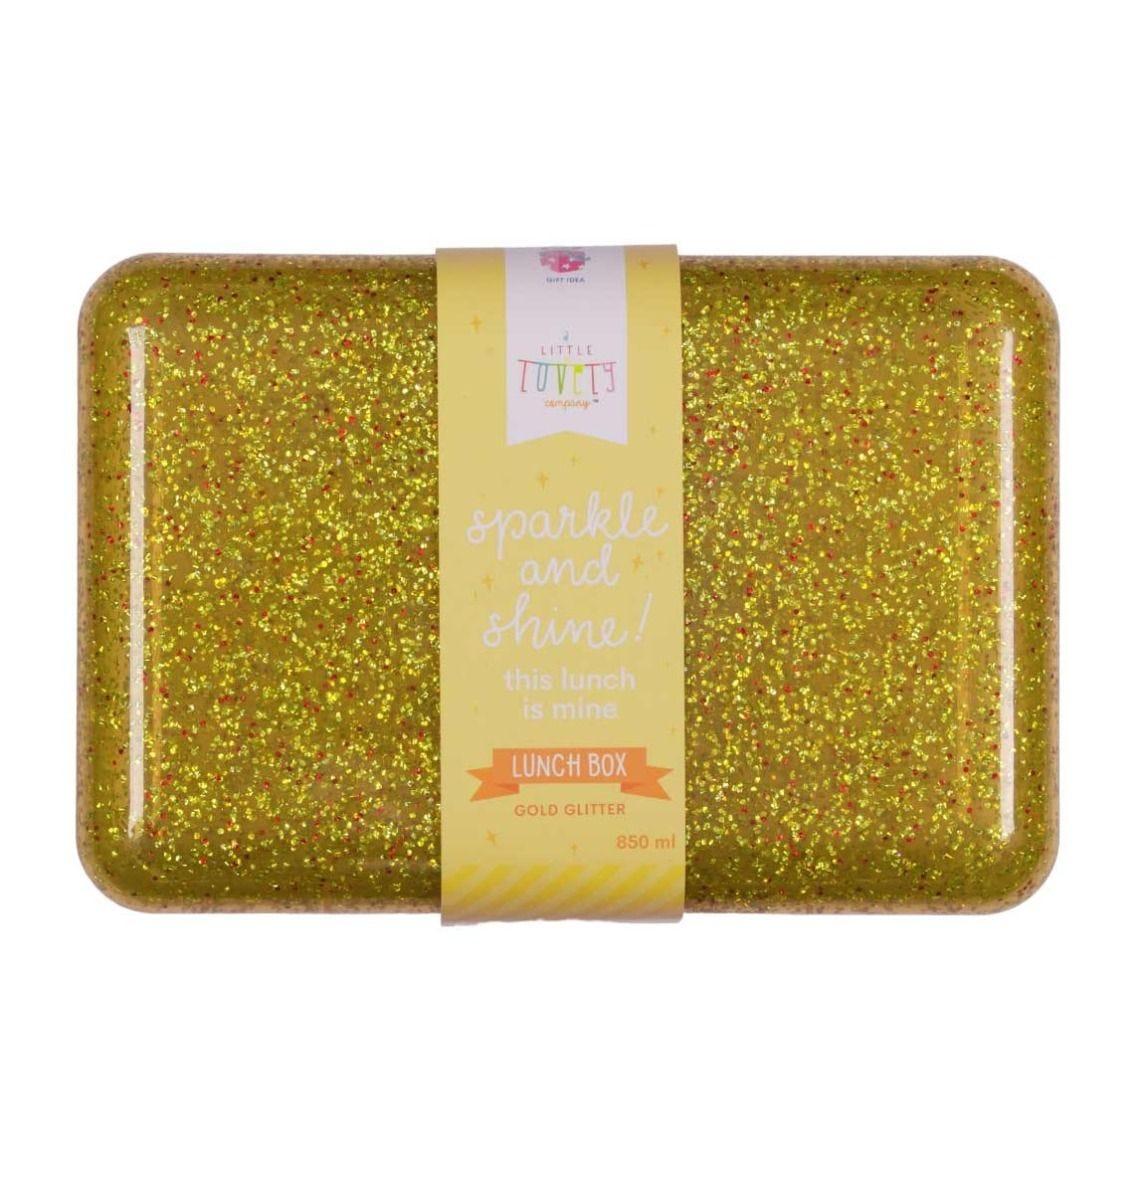 sbglgo26-lr-1-lunch-box-glitter-gold